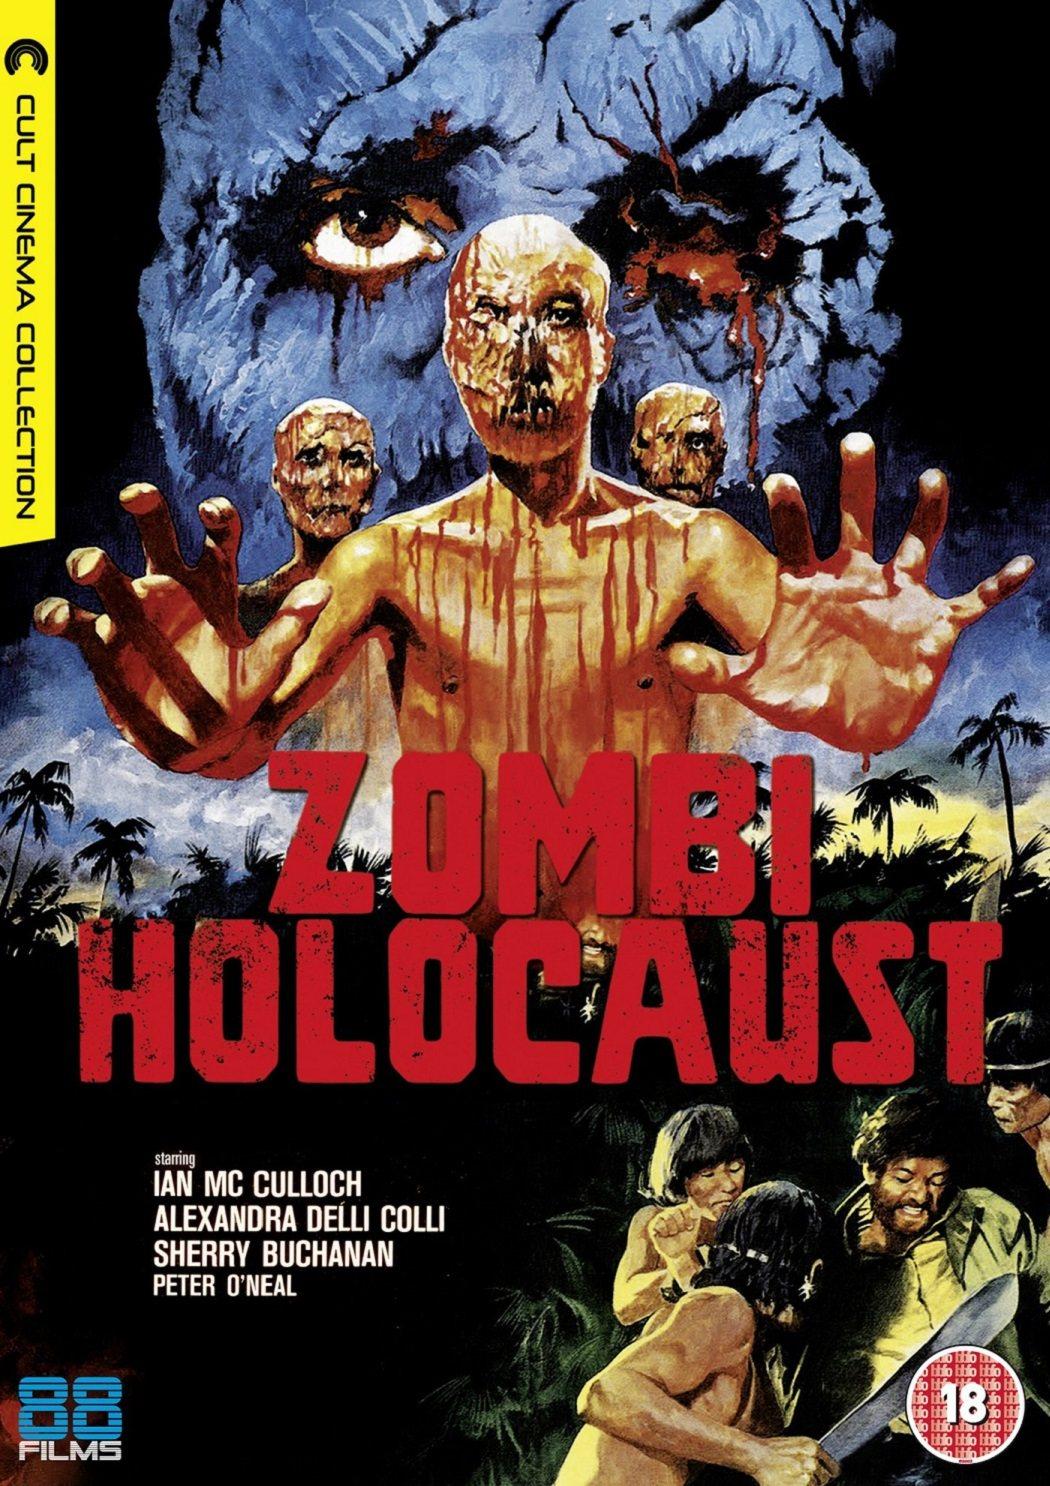 'Zombi holocausto'